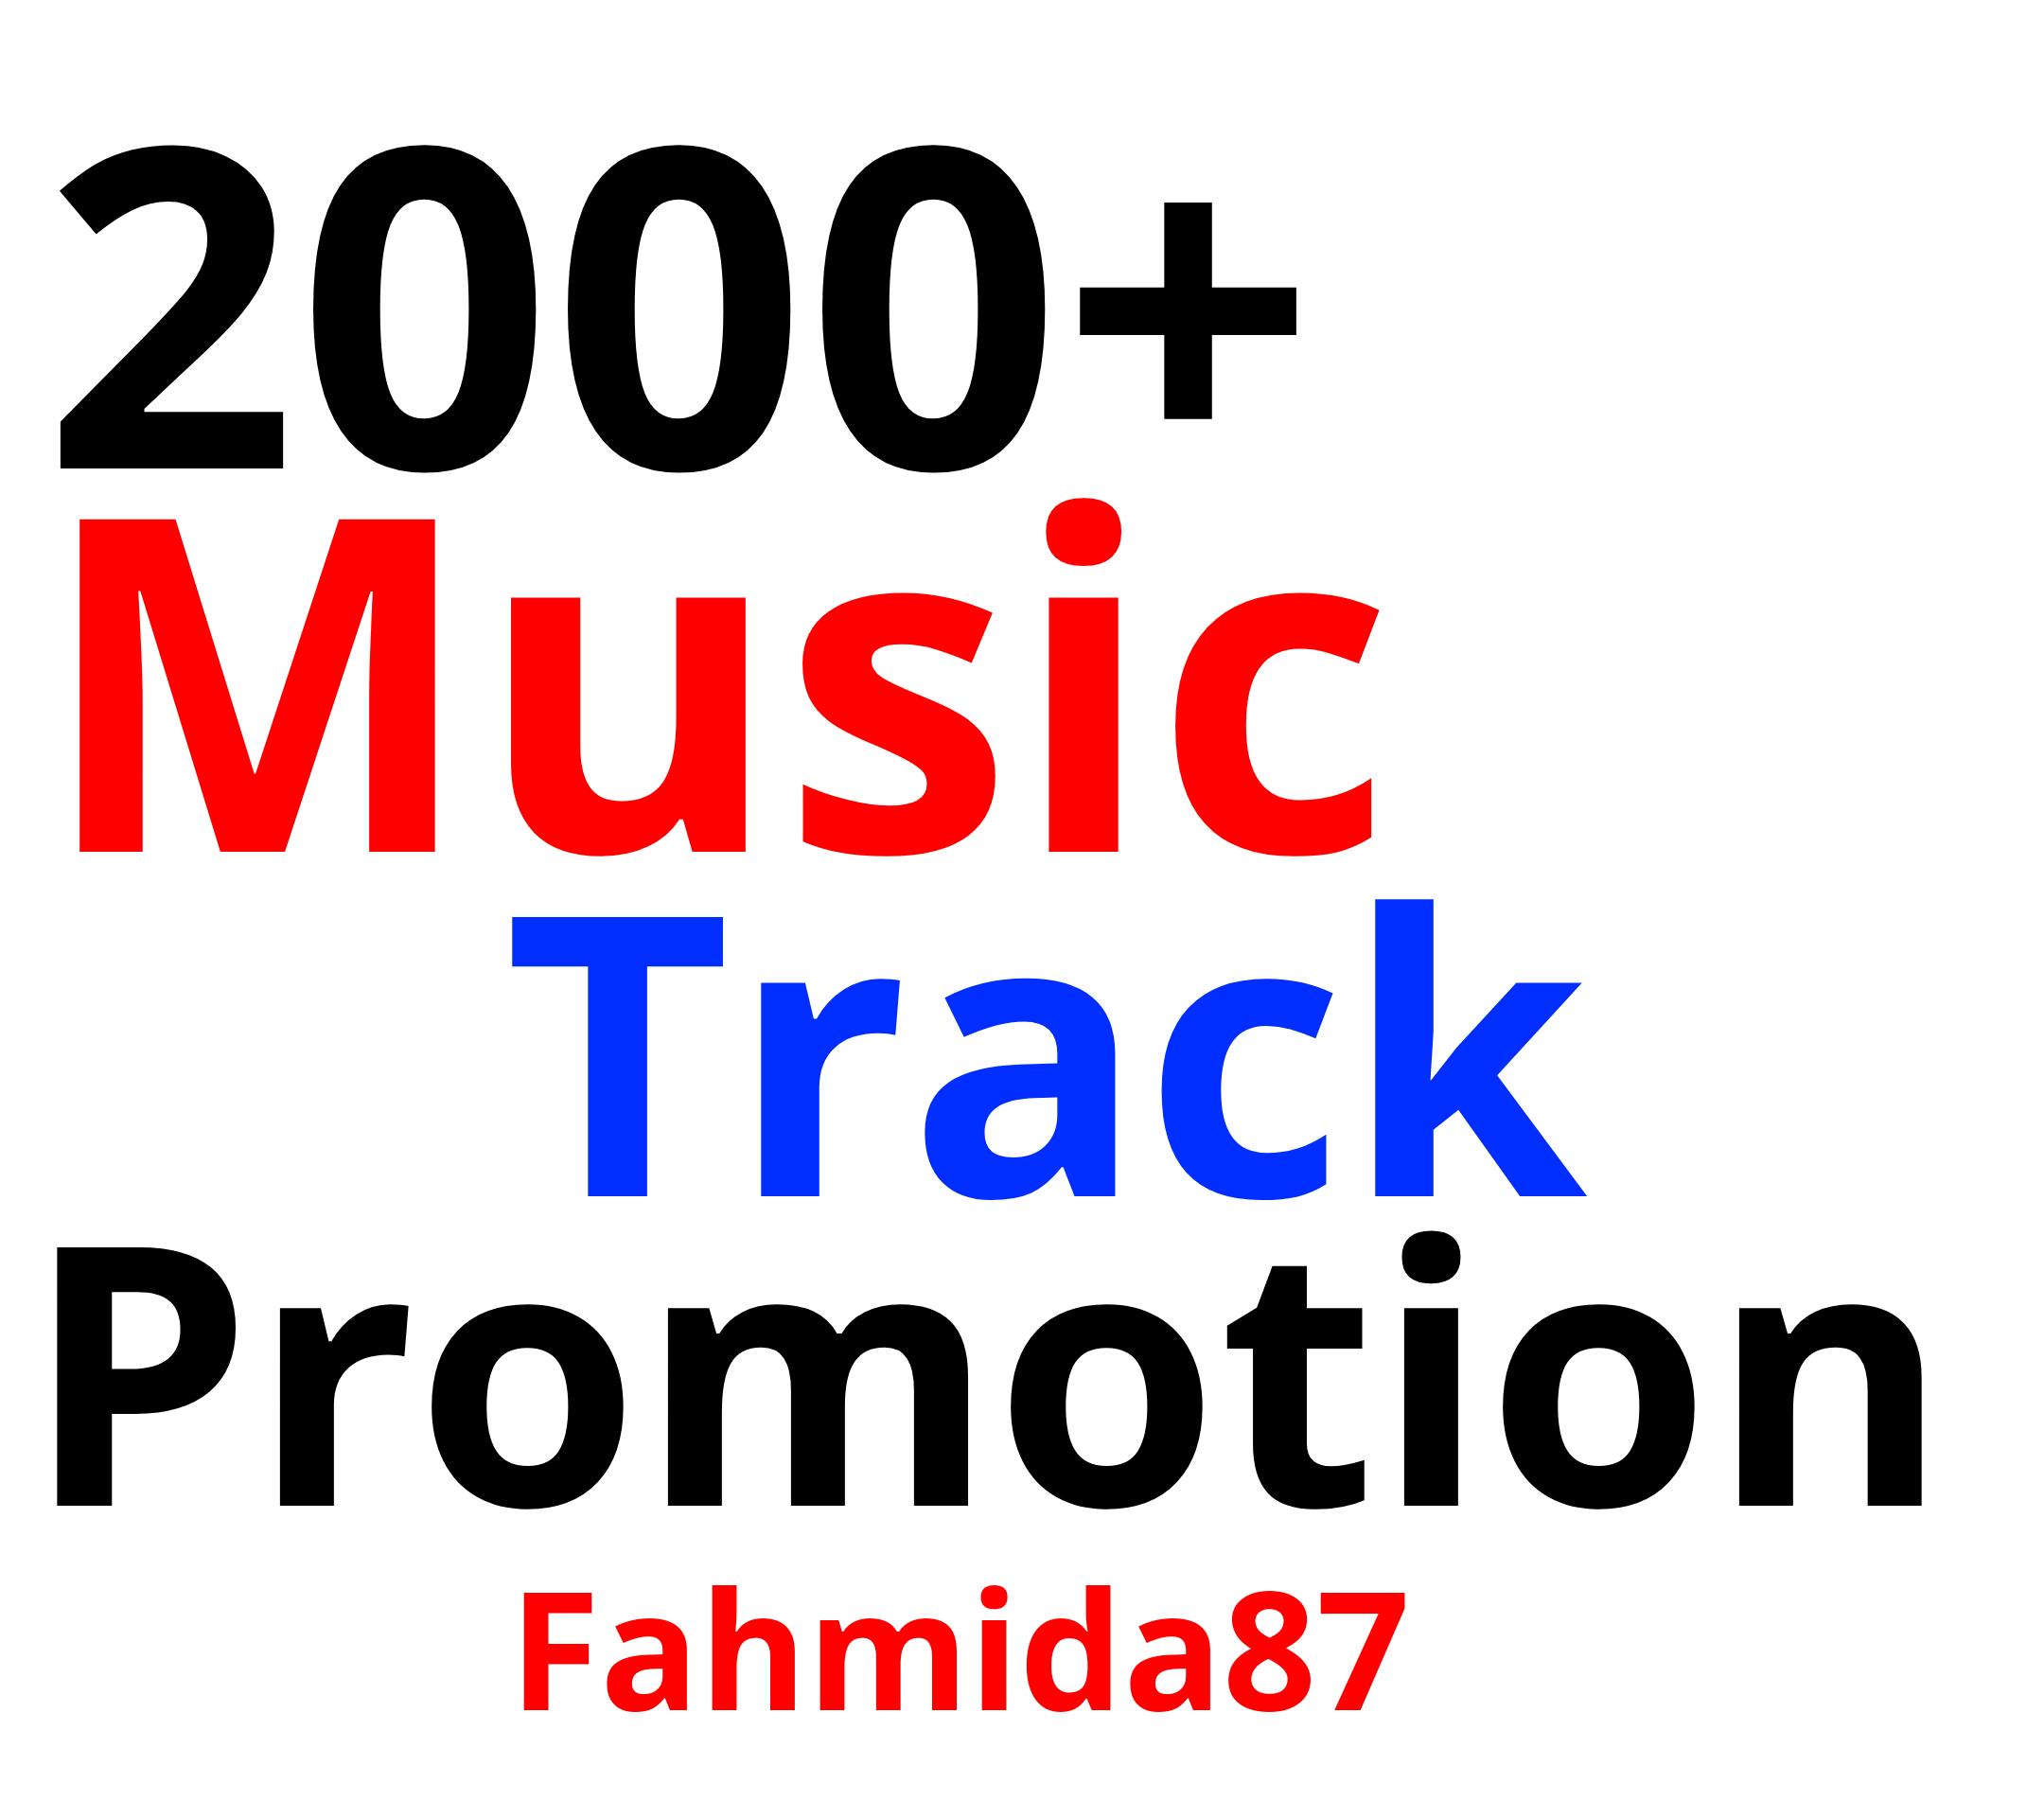 Music Promotion 2000 Real Track Promotion Unique Listener's